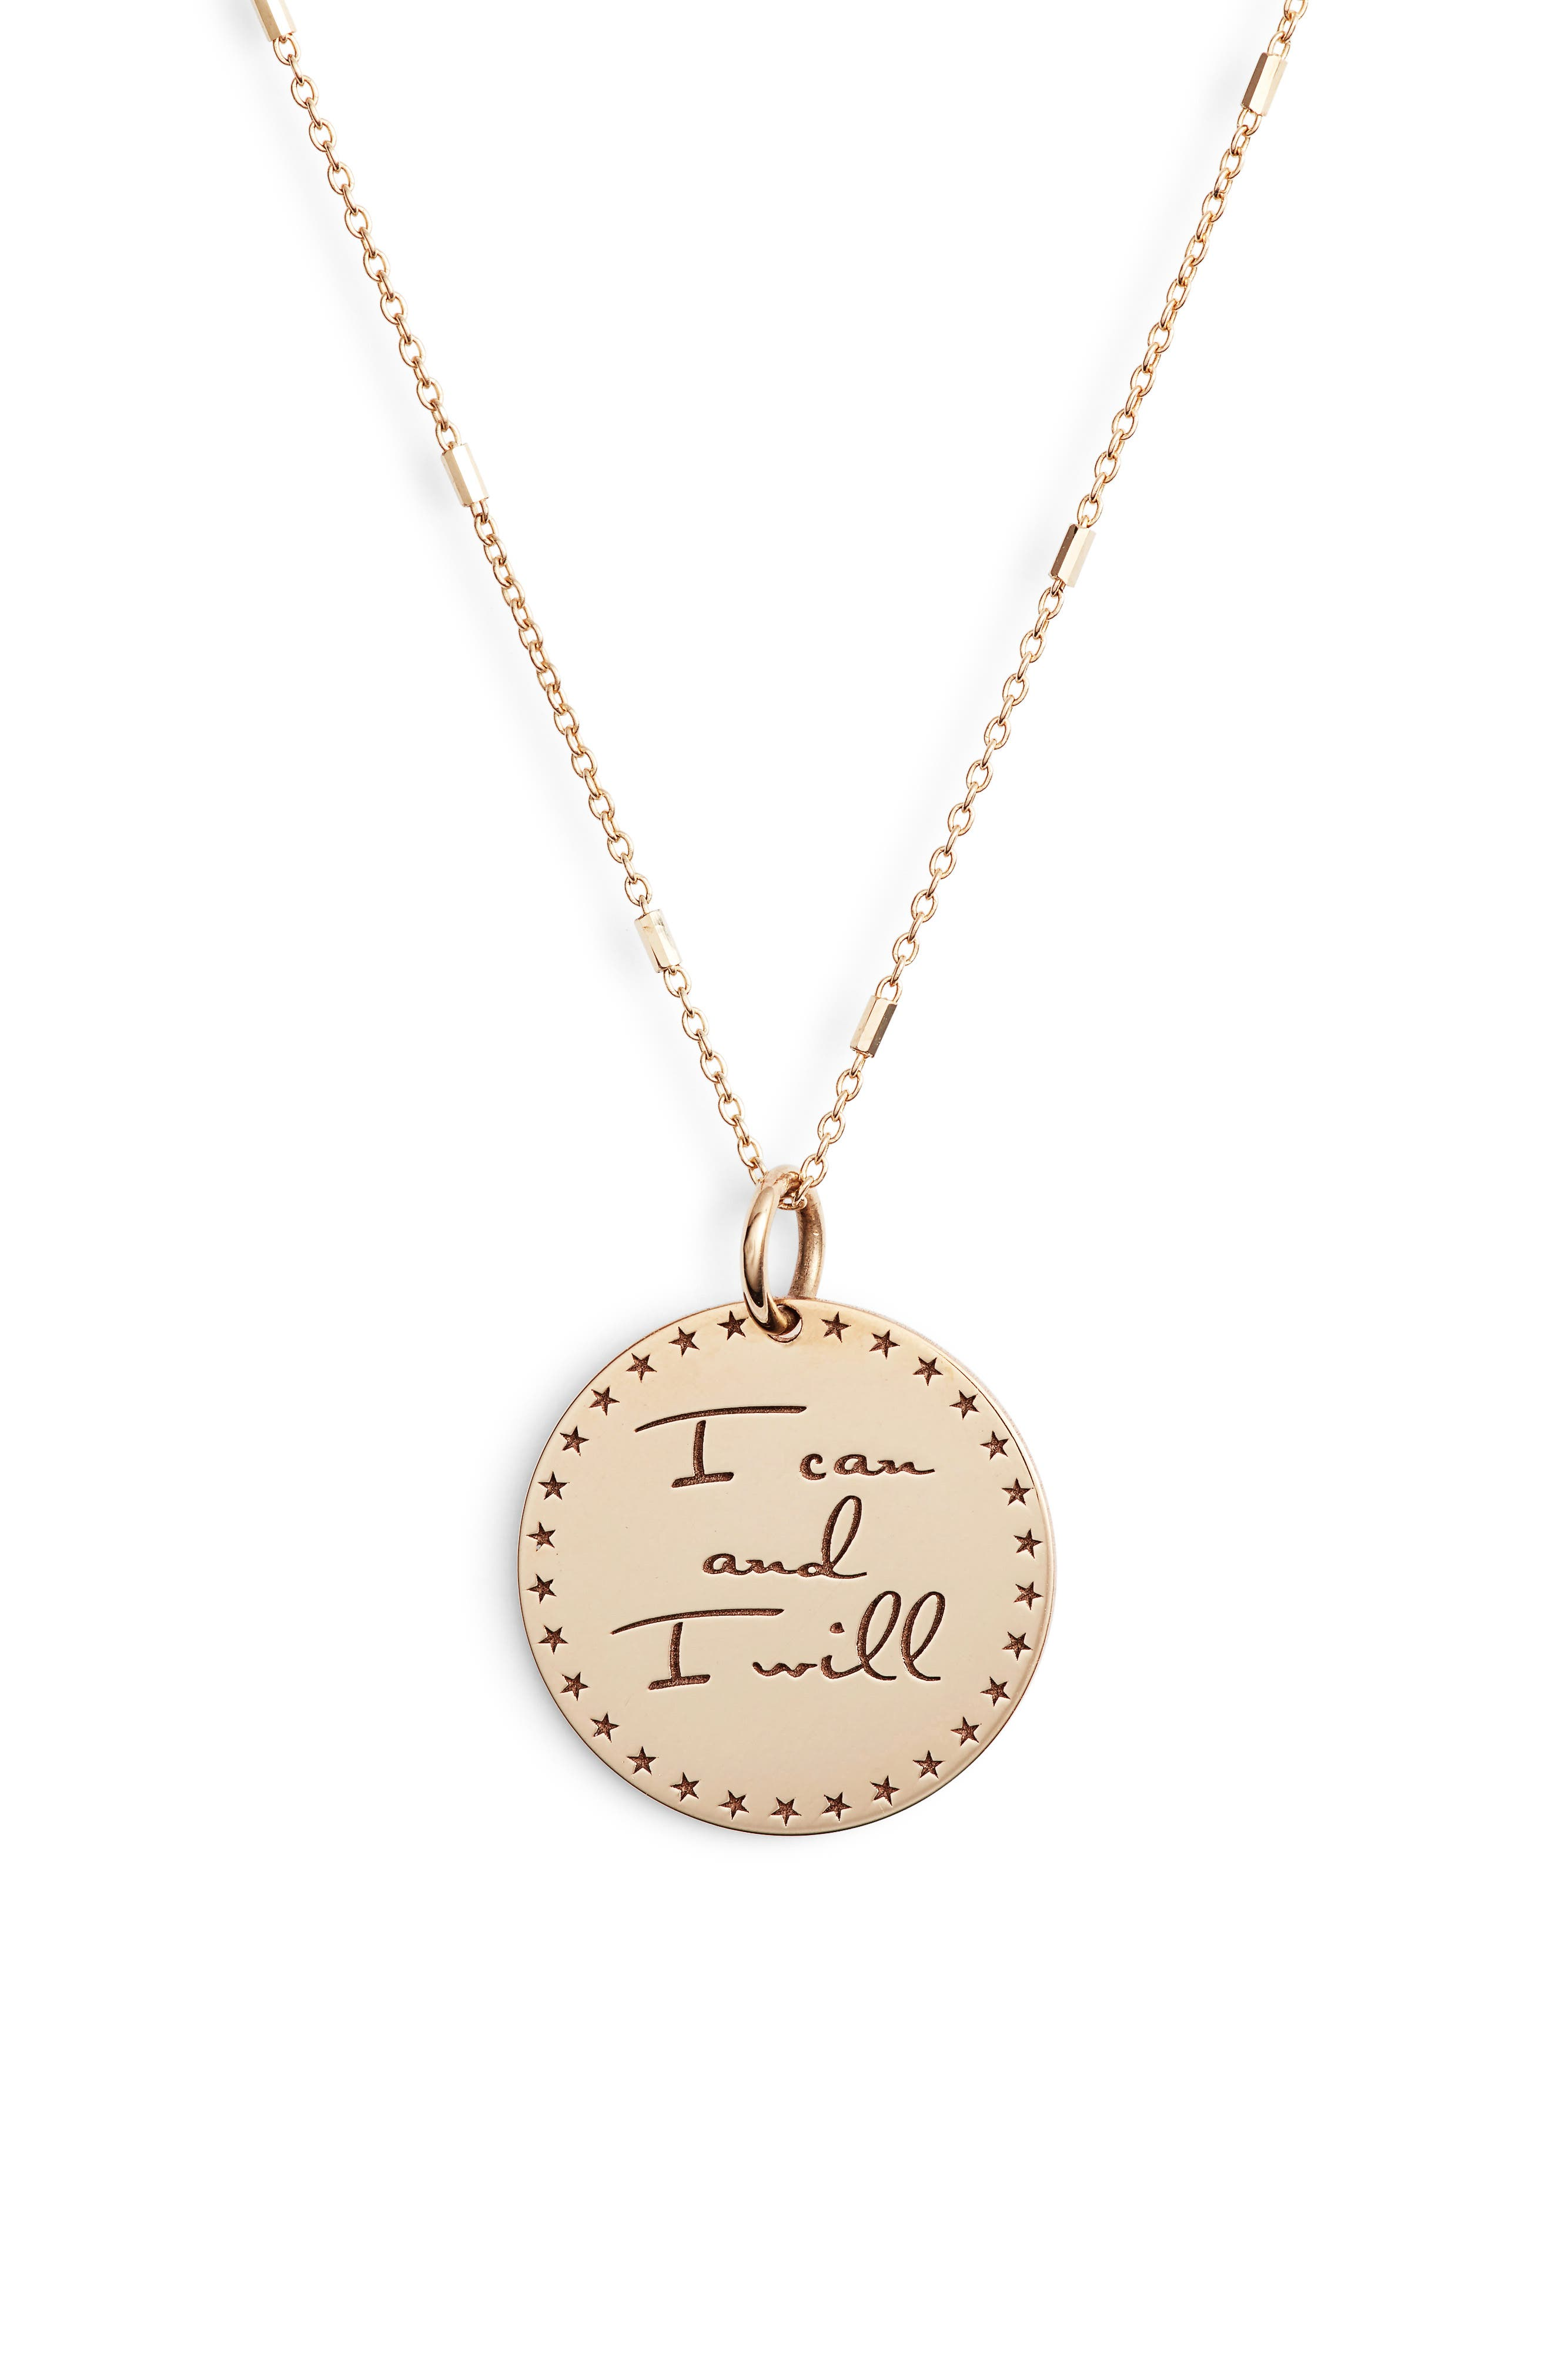 Zoe Chicco Mantra Pendant Necklace